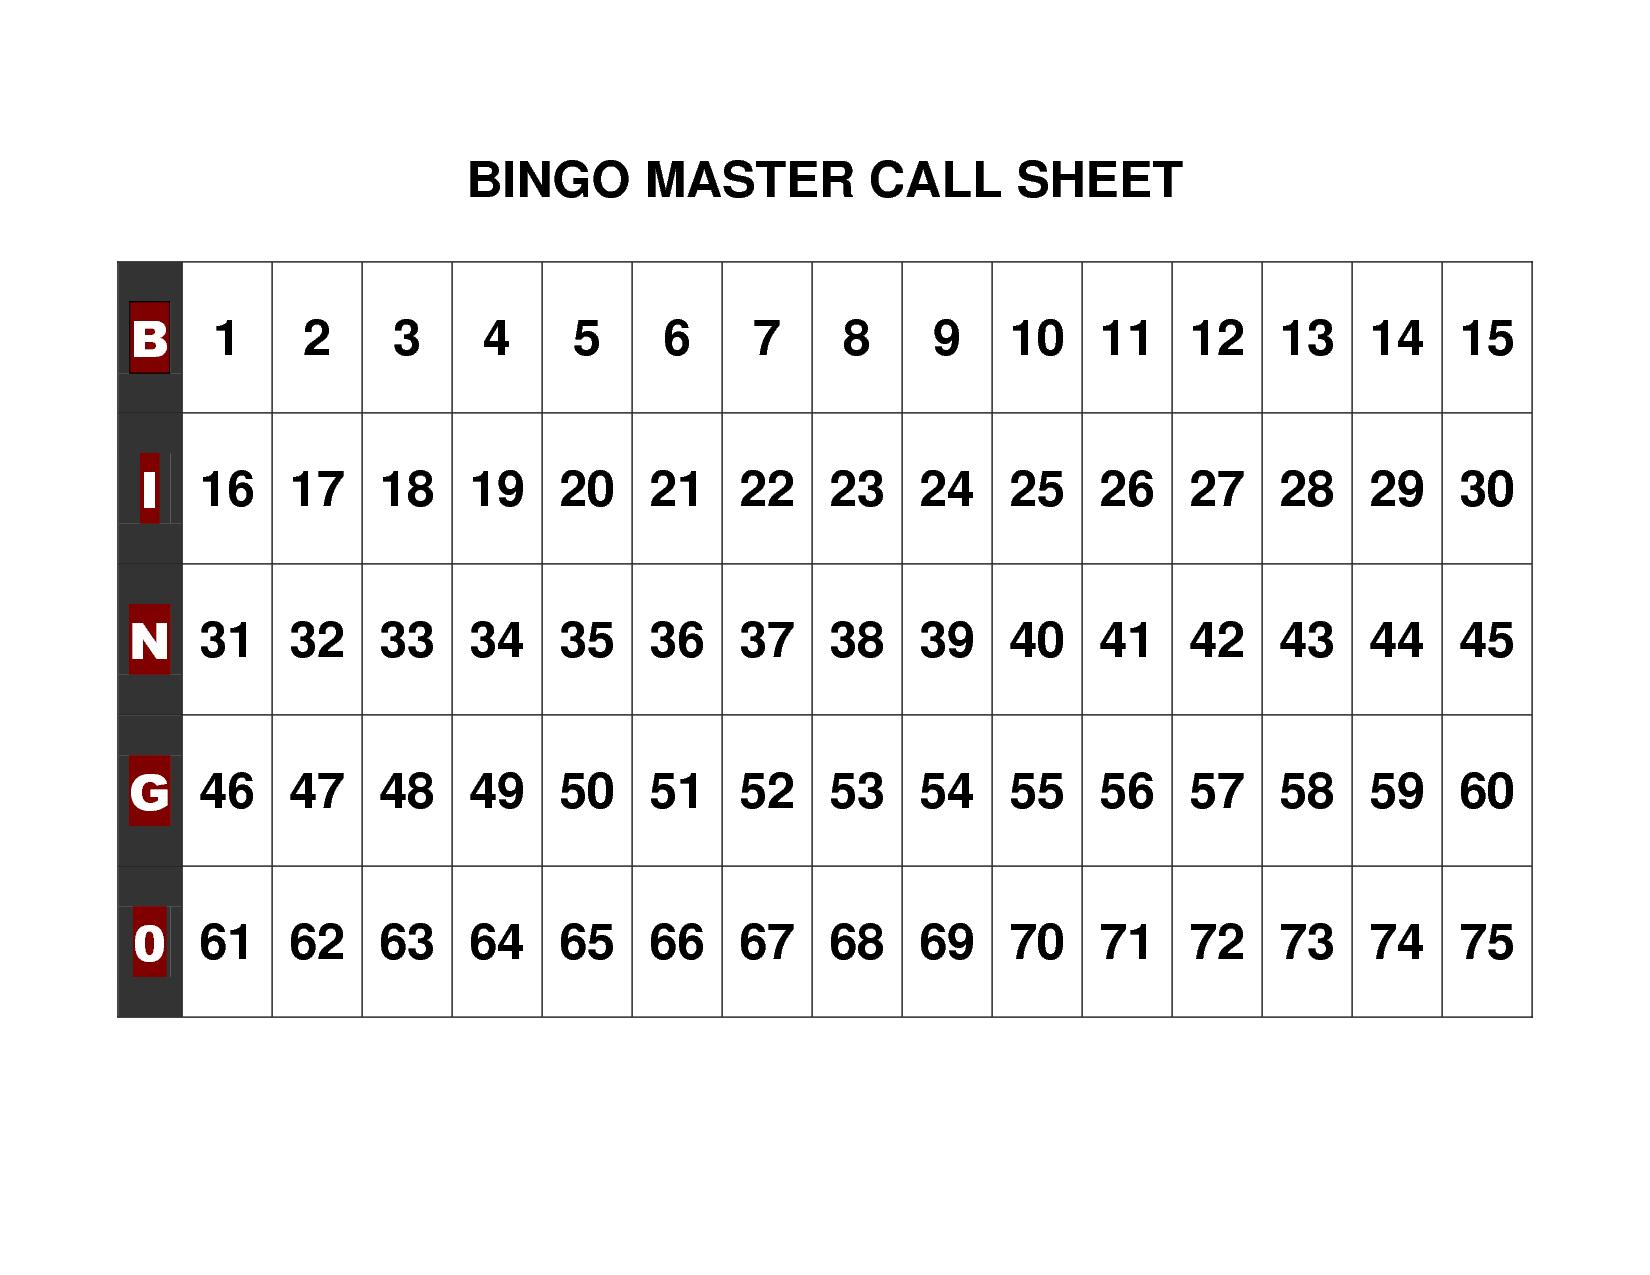 Free+Printable+Bingo+Call+Sheet | Bingo | Pinterest | Bingo Calls - Free Printable Bingo Chips